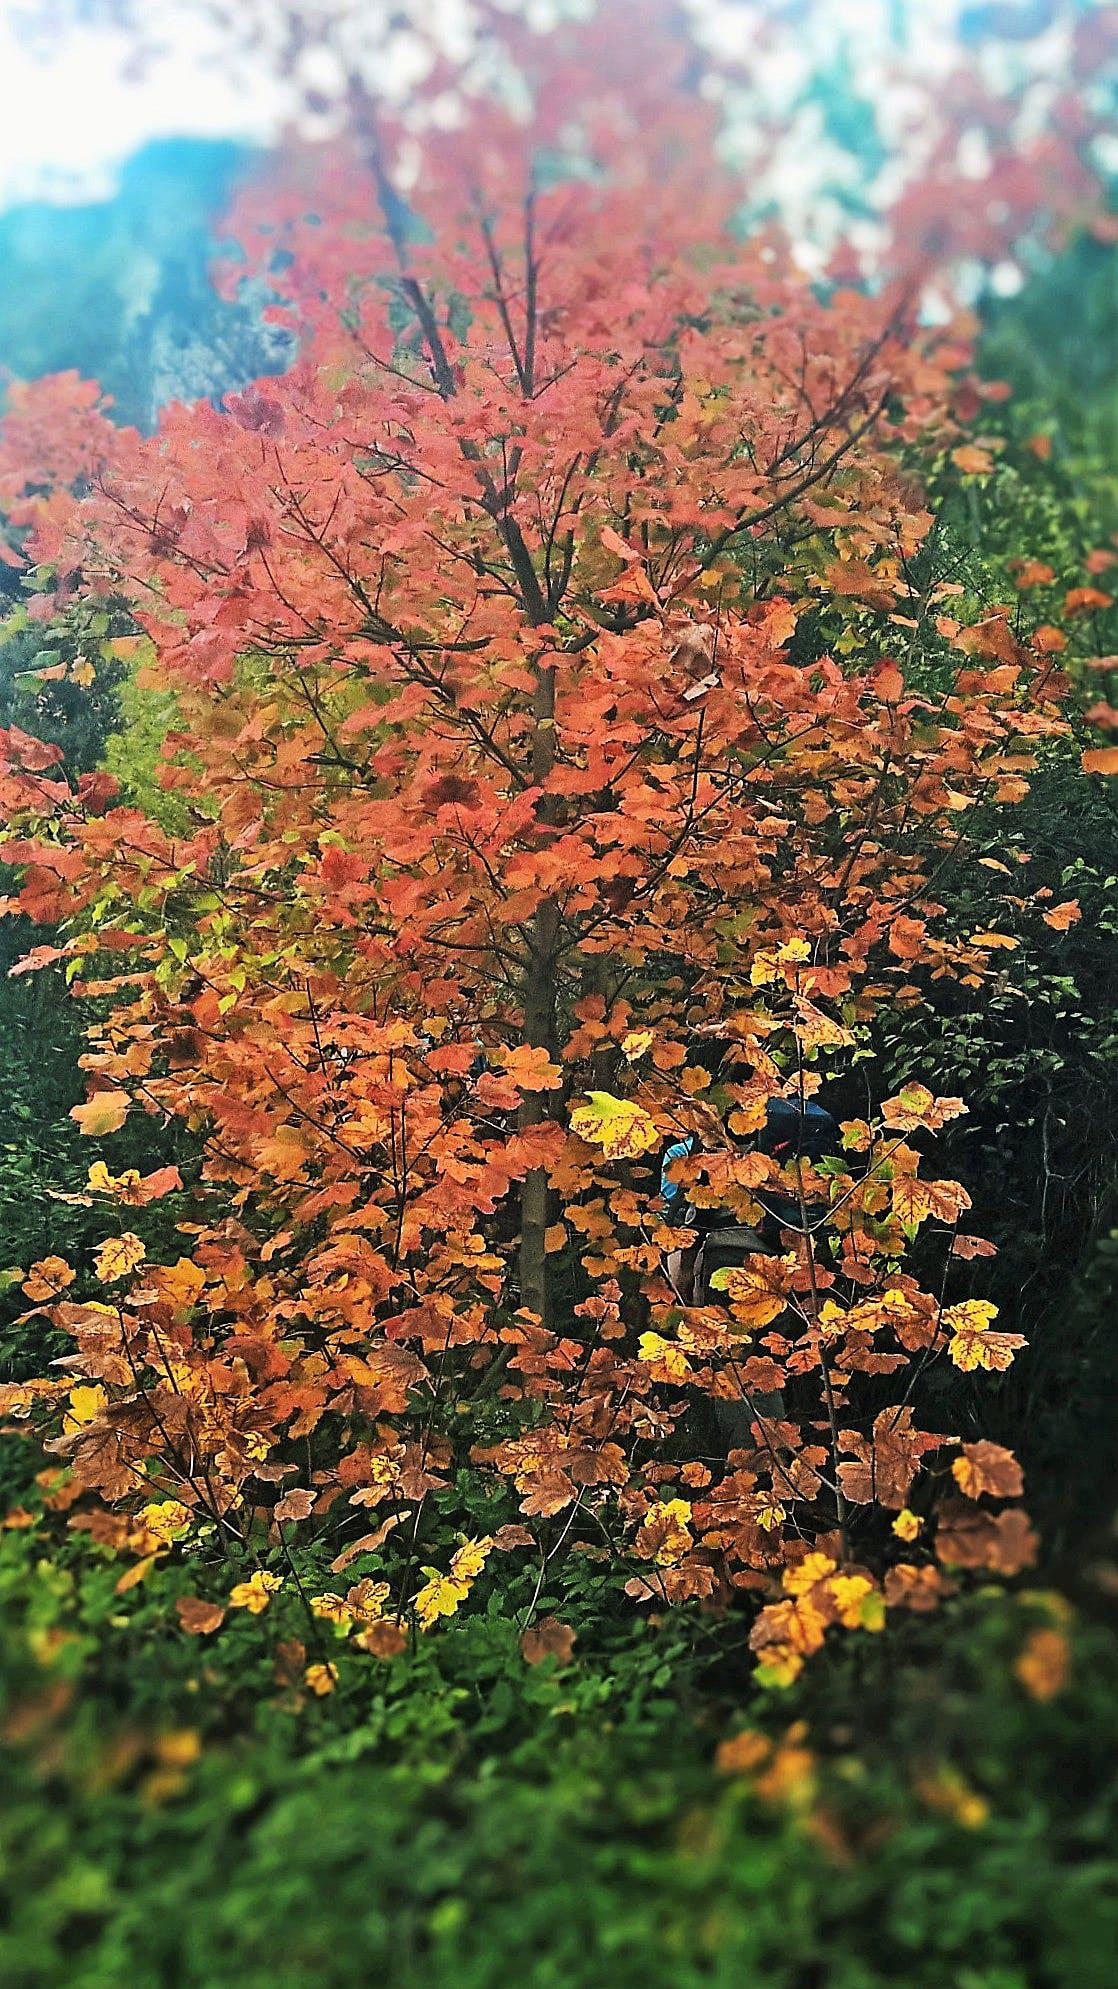 Free stock photo of autumn leaf